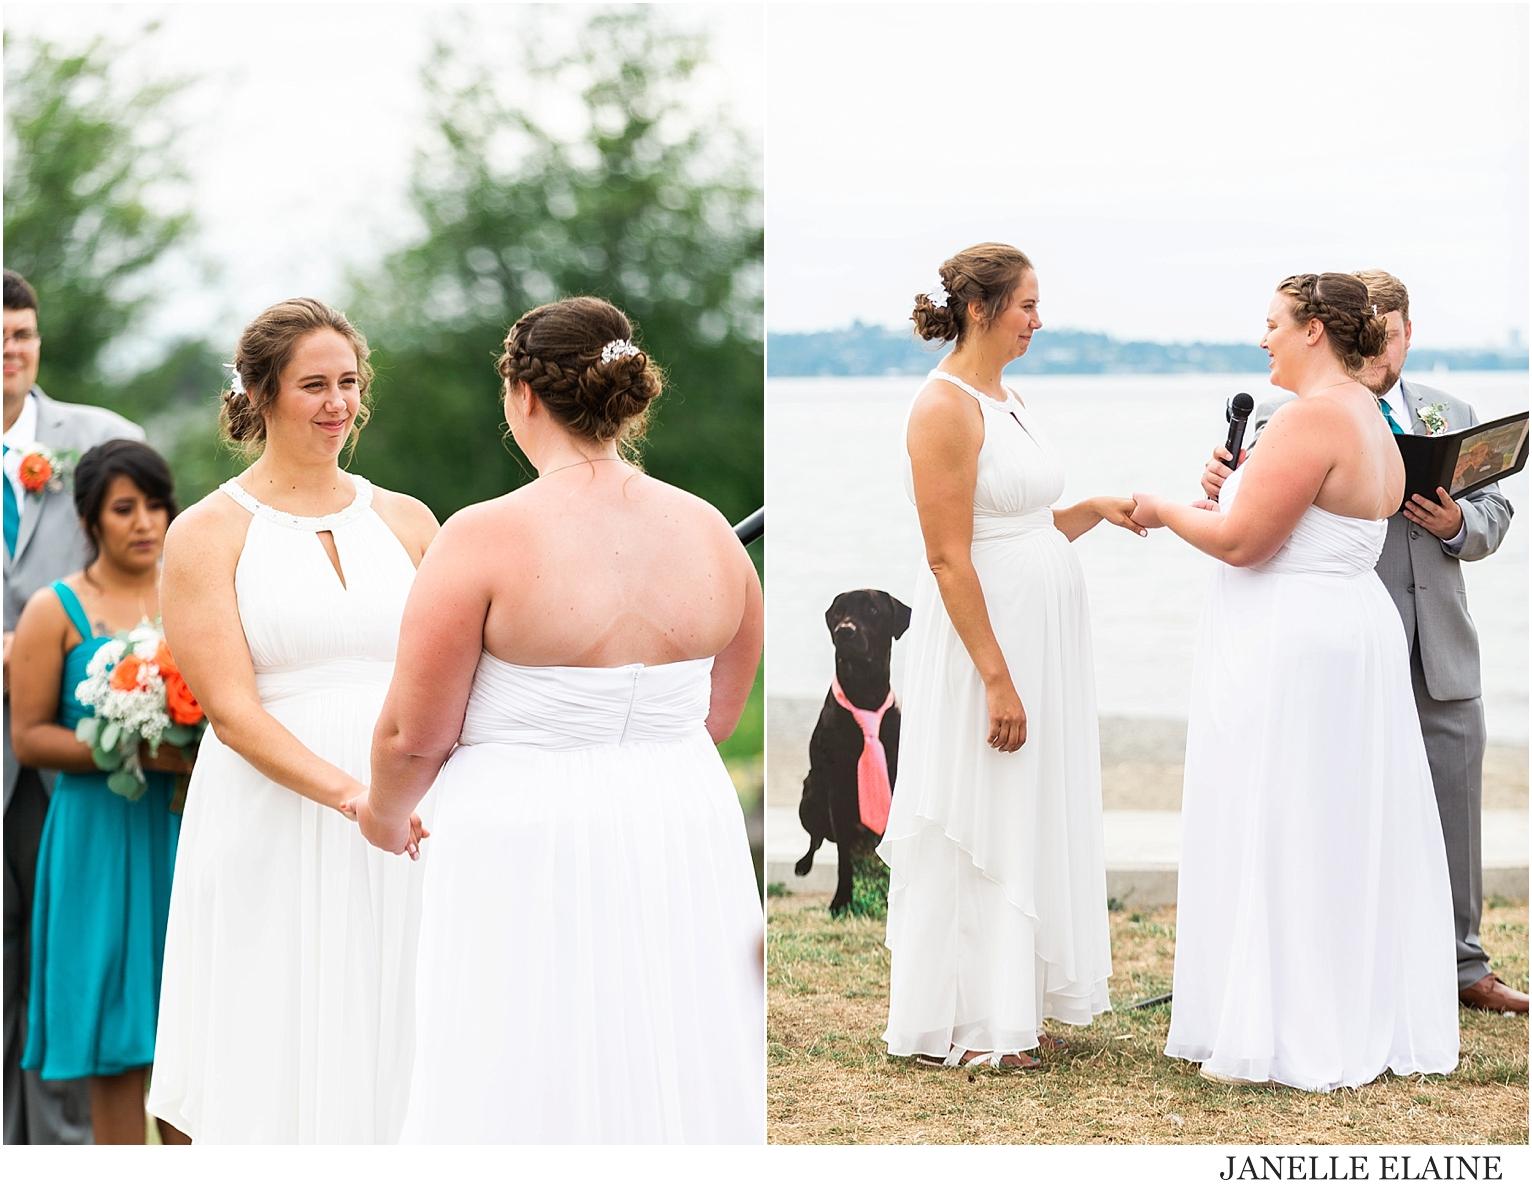 liz and christina lanning-ceremony-luther burbank park-janelle elaine photography-111.jpg